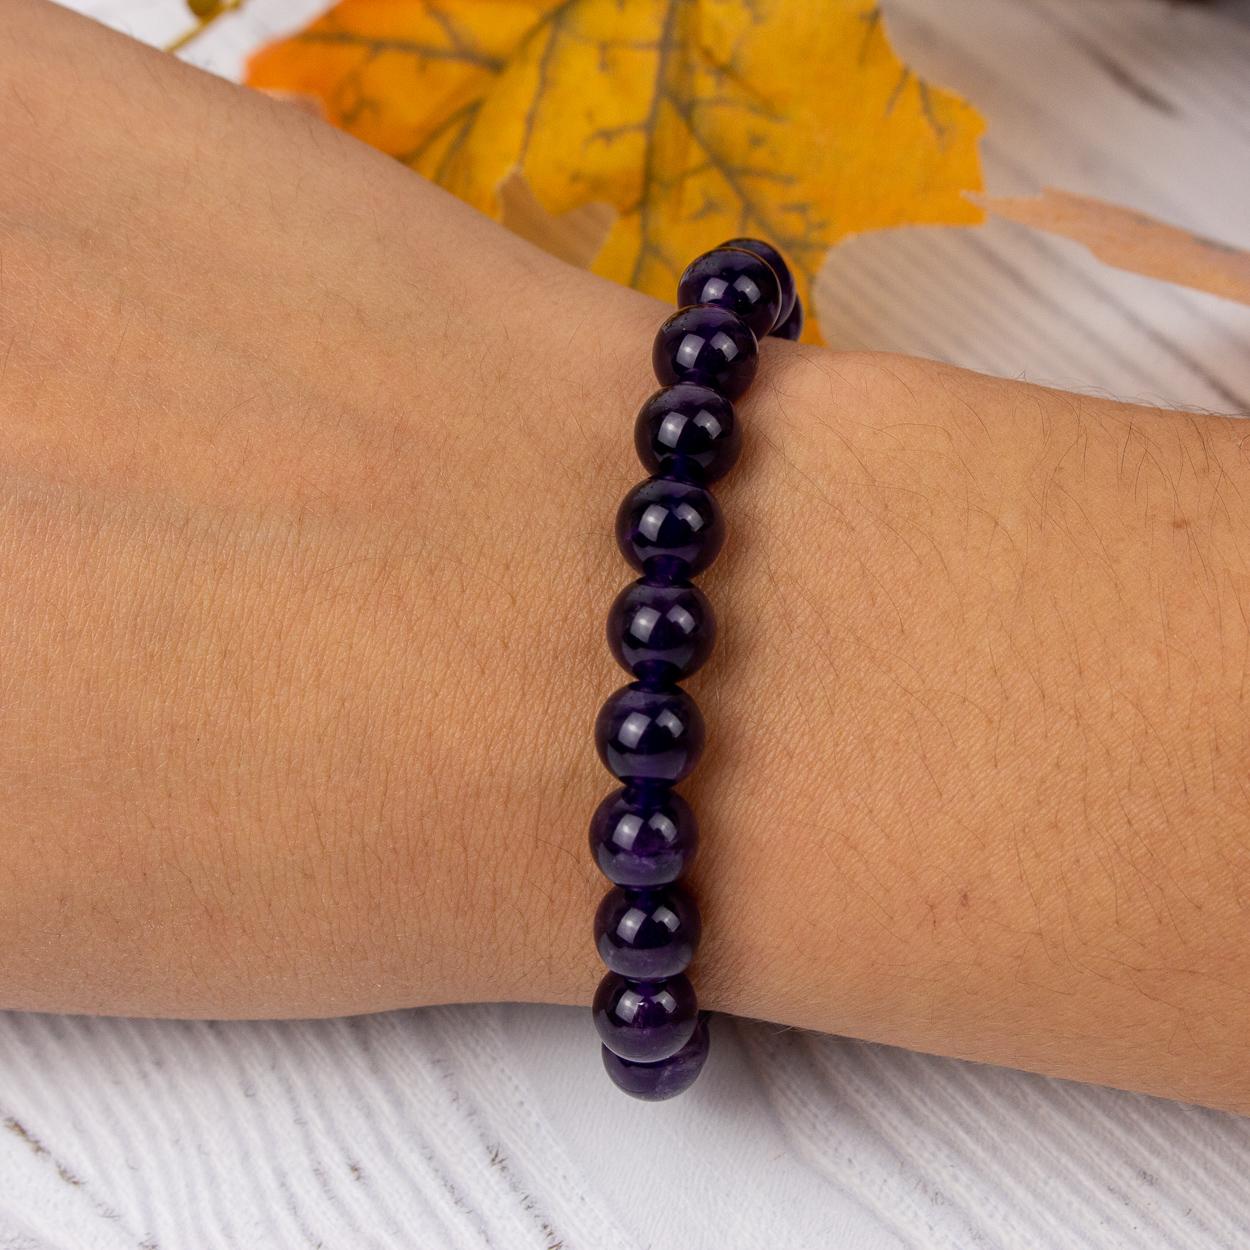 Amethyst (High Quality) Bracelet